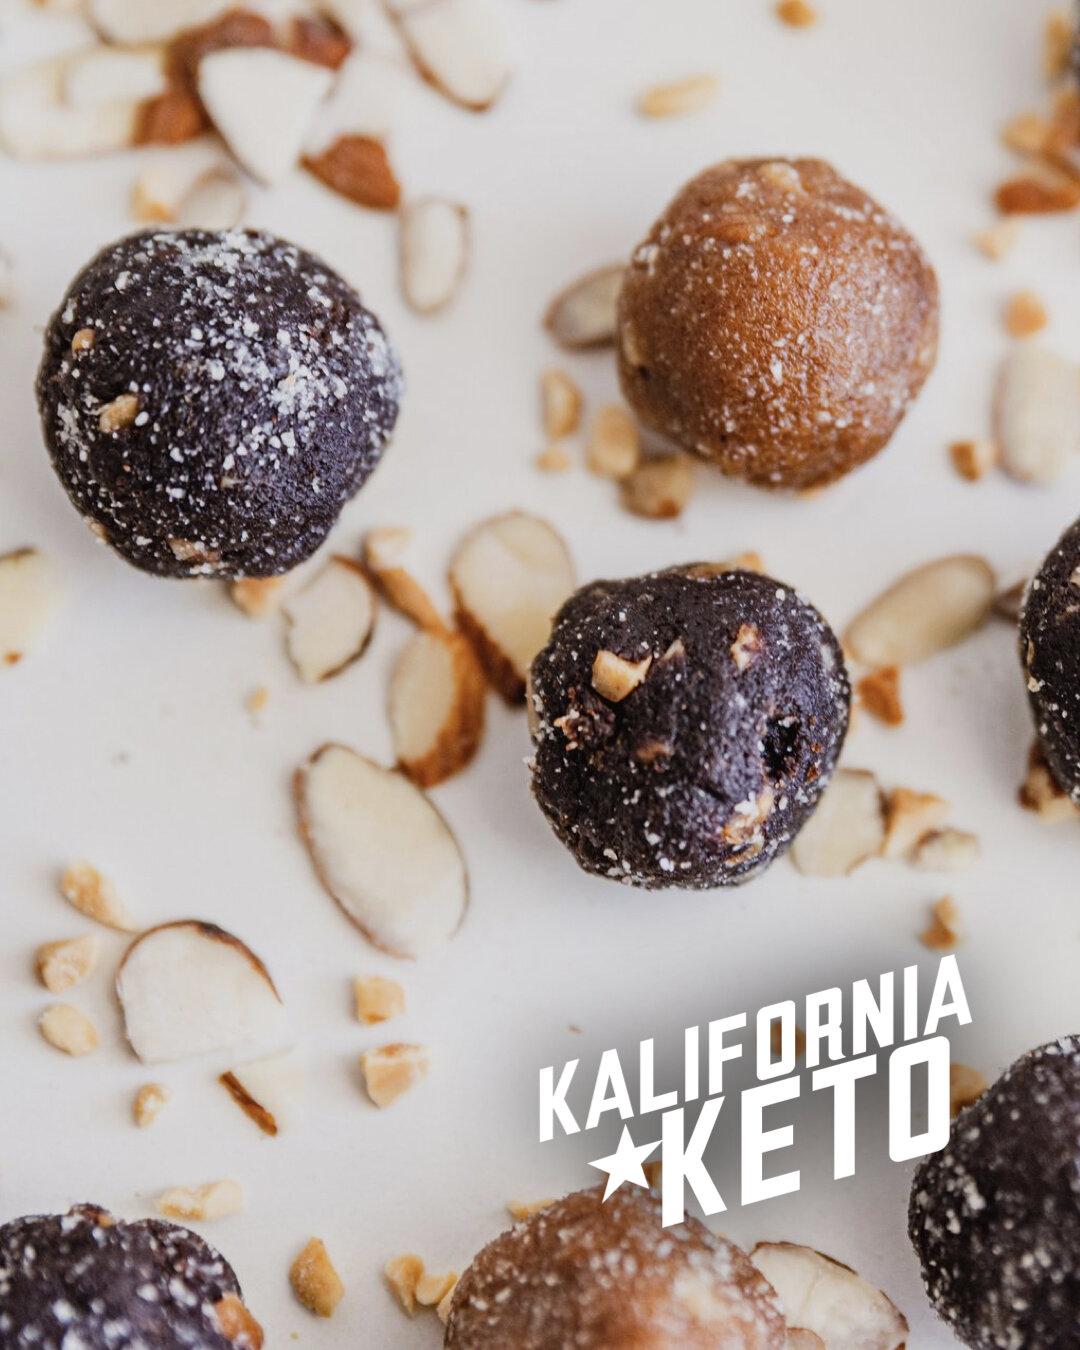 KaliforniaKeto_West 2019 - Headshots.001.jpeg